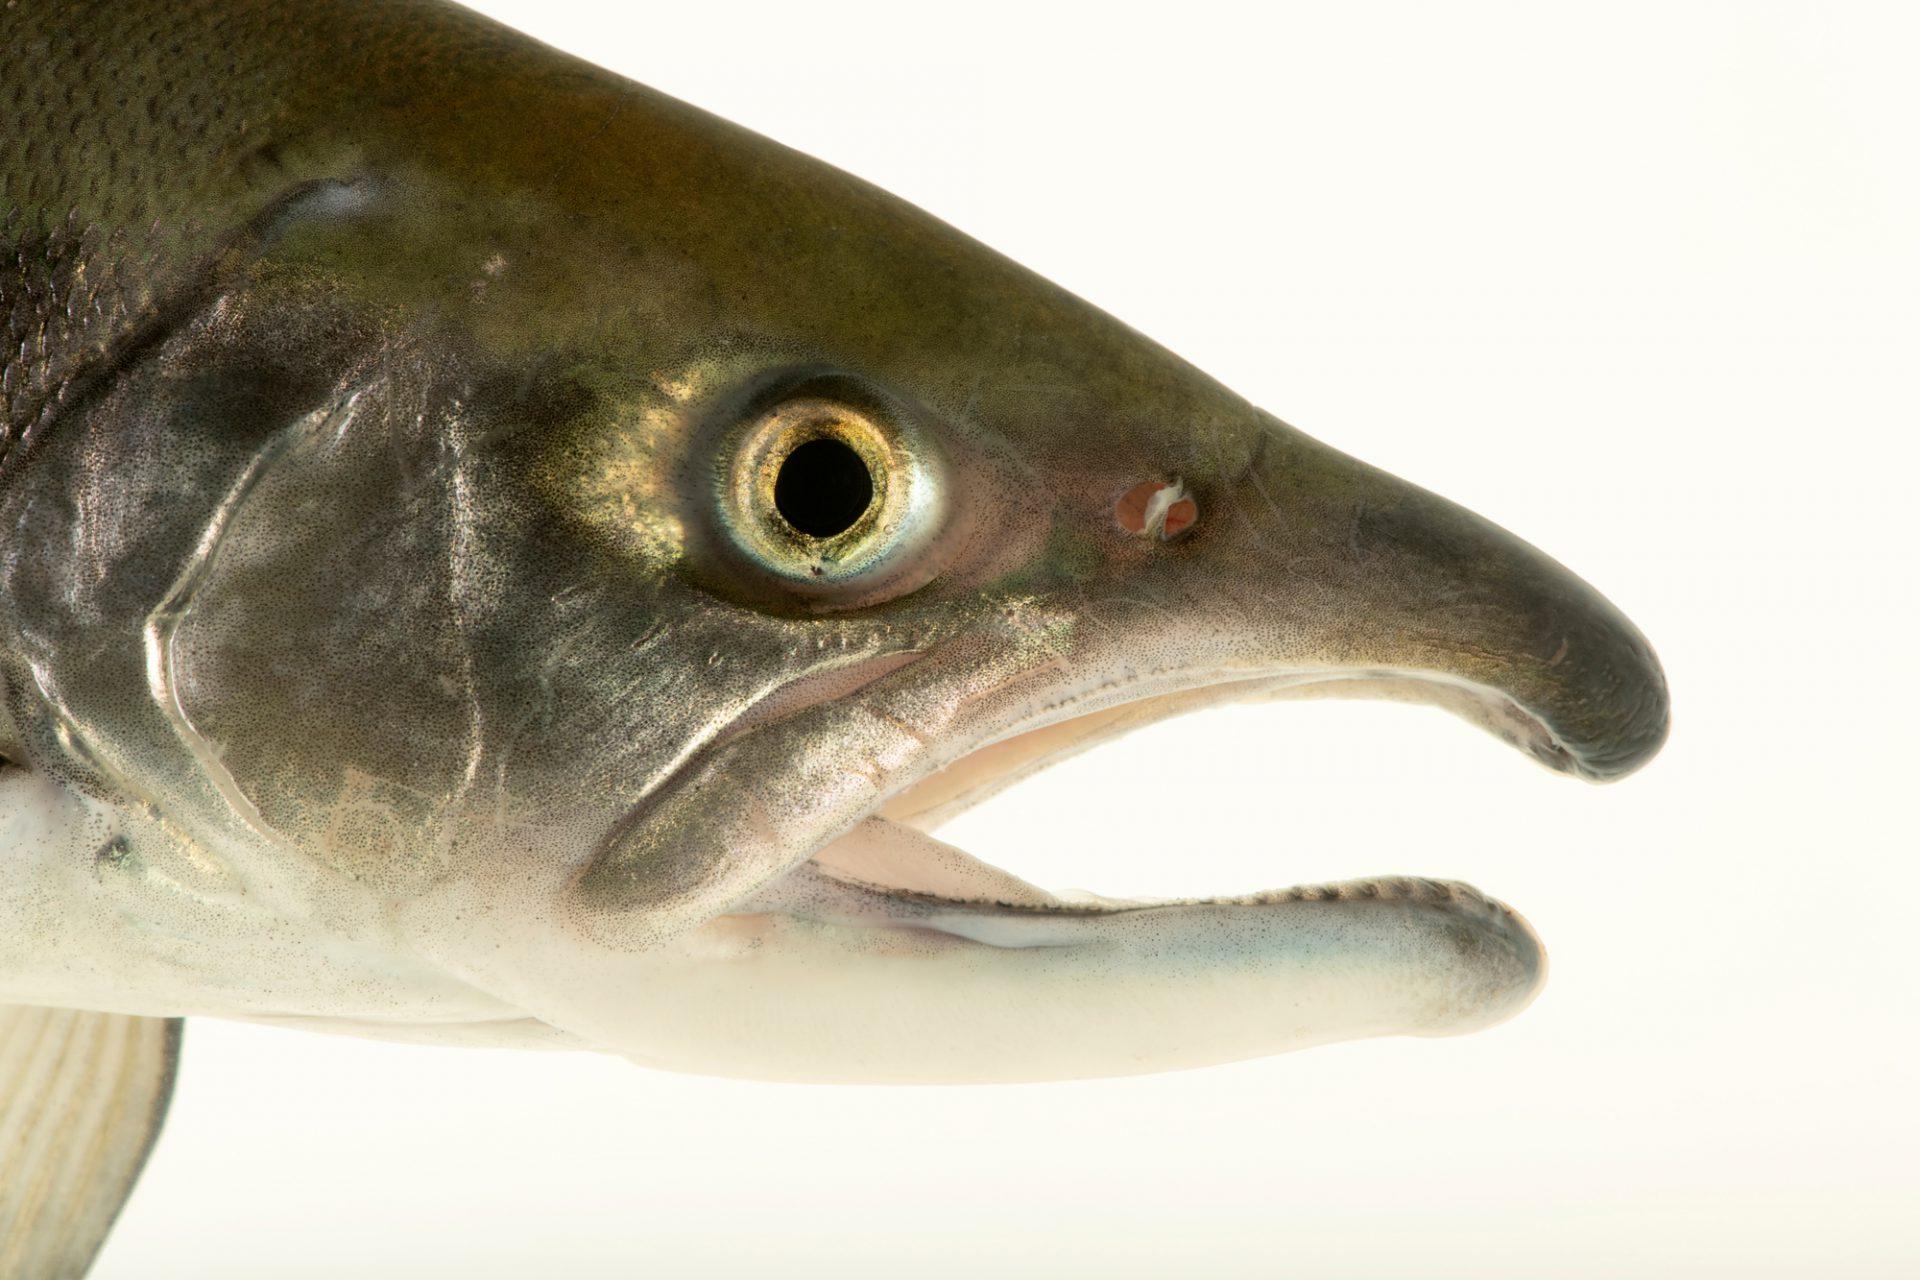 Photo: Kokanee salmon (Oncorhynchus nerka) photographed at Downtown Aquarium in Denver, Colorado.